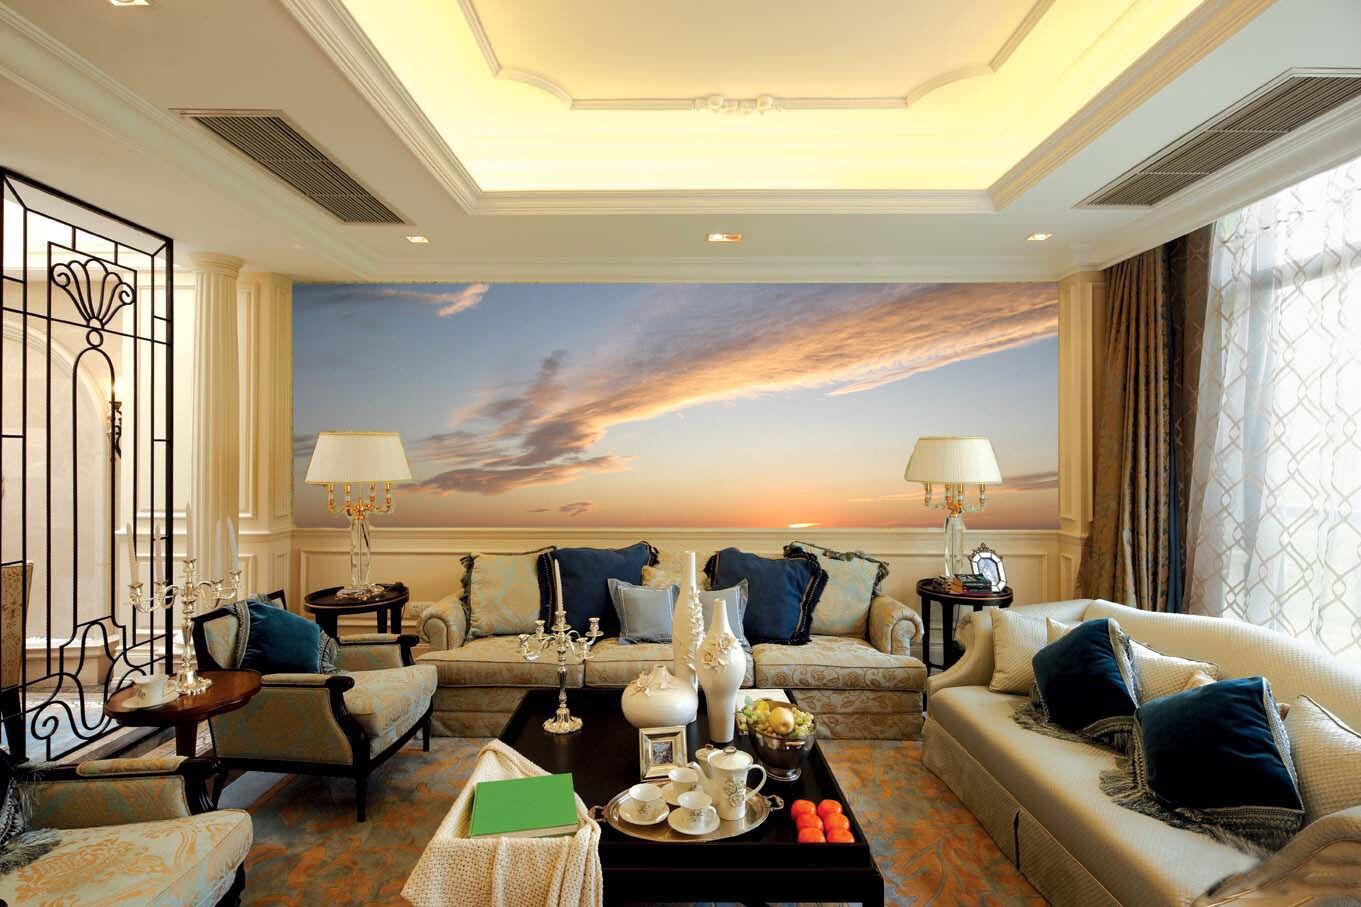 3D 3D 3D Pretty Sunset Glow 3 Wall Paper Wall Print Decal Wall Deco Wall Indoor Murals 1c37c6